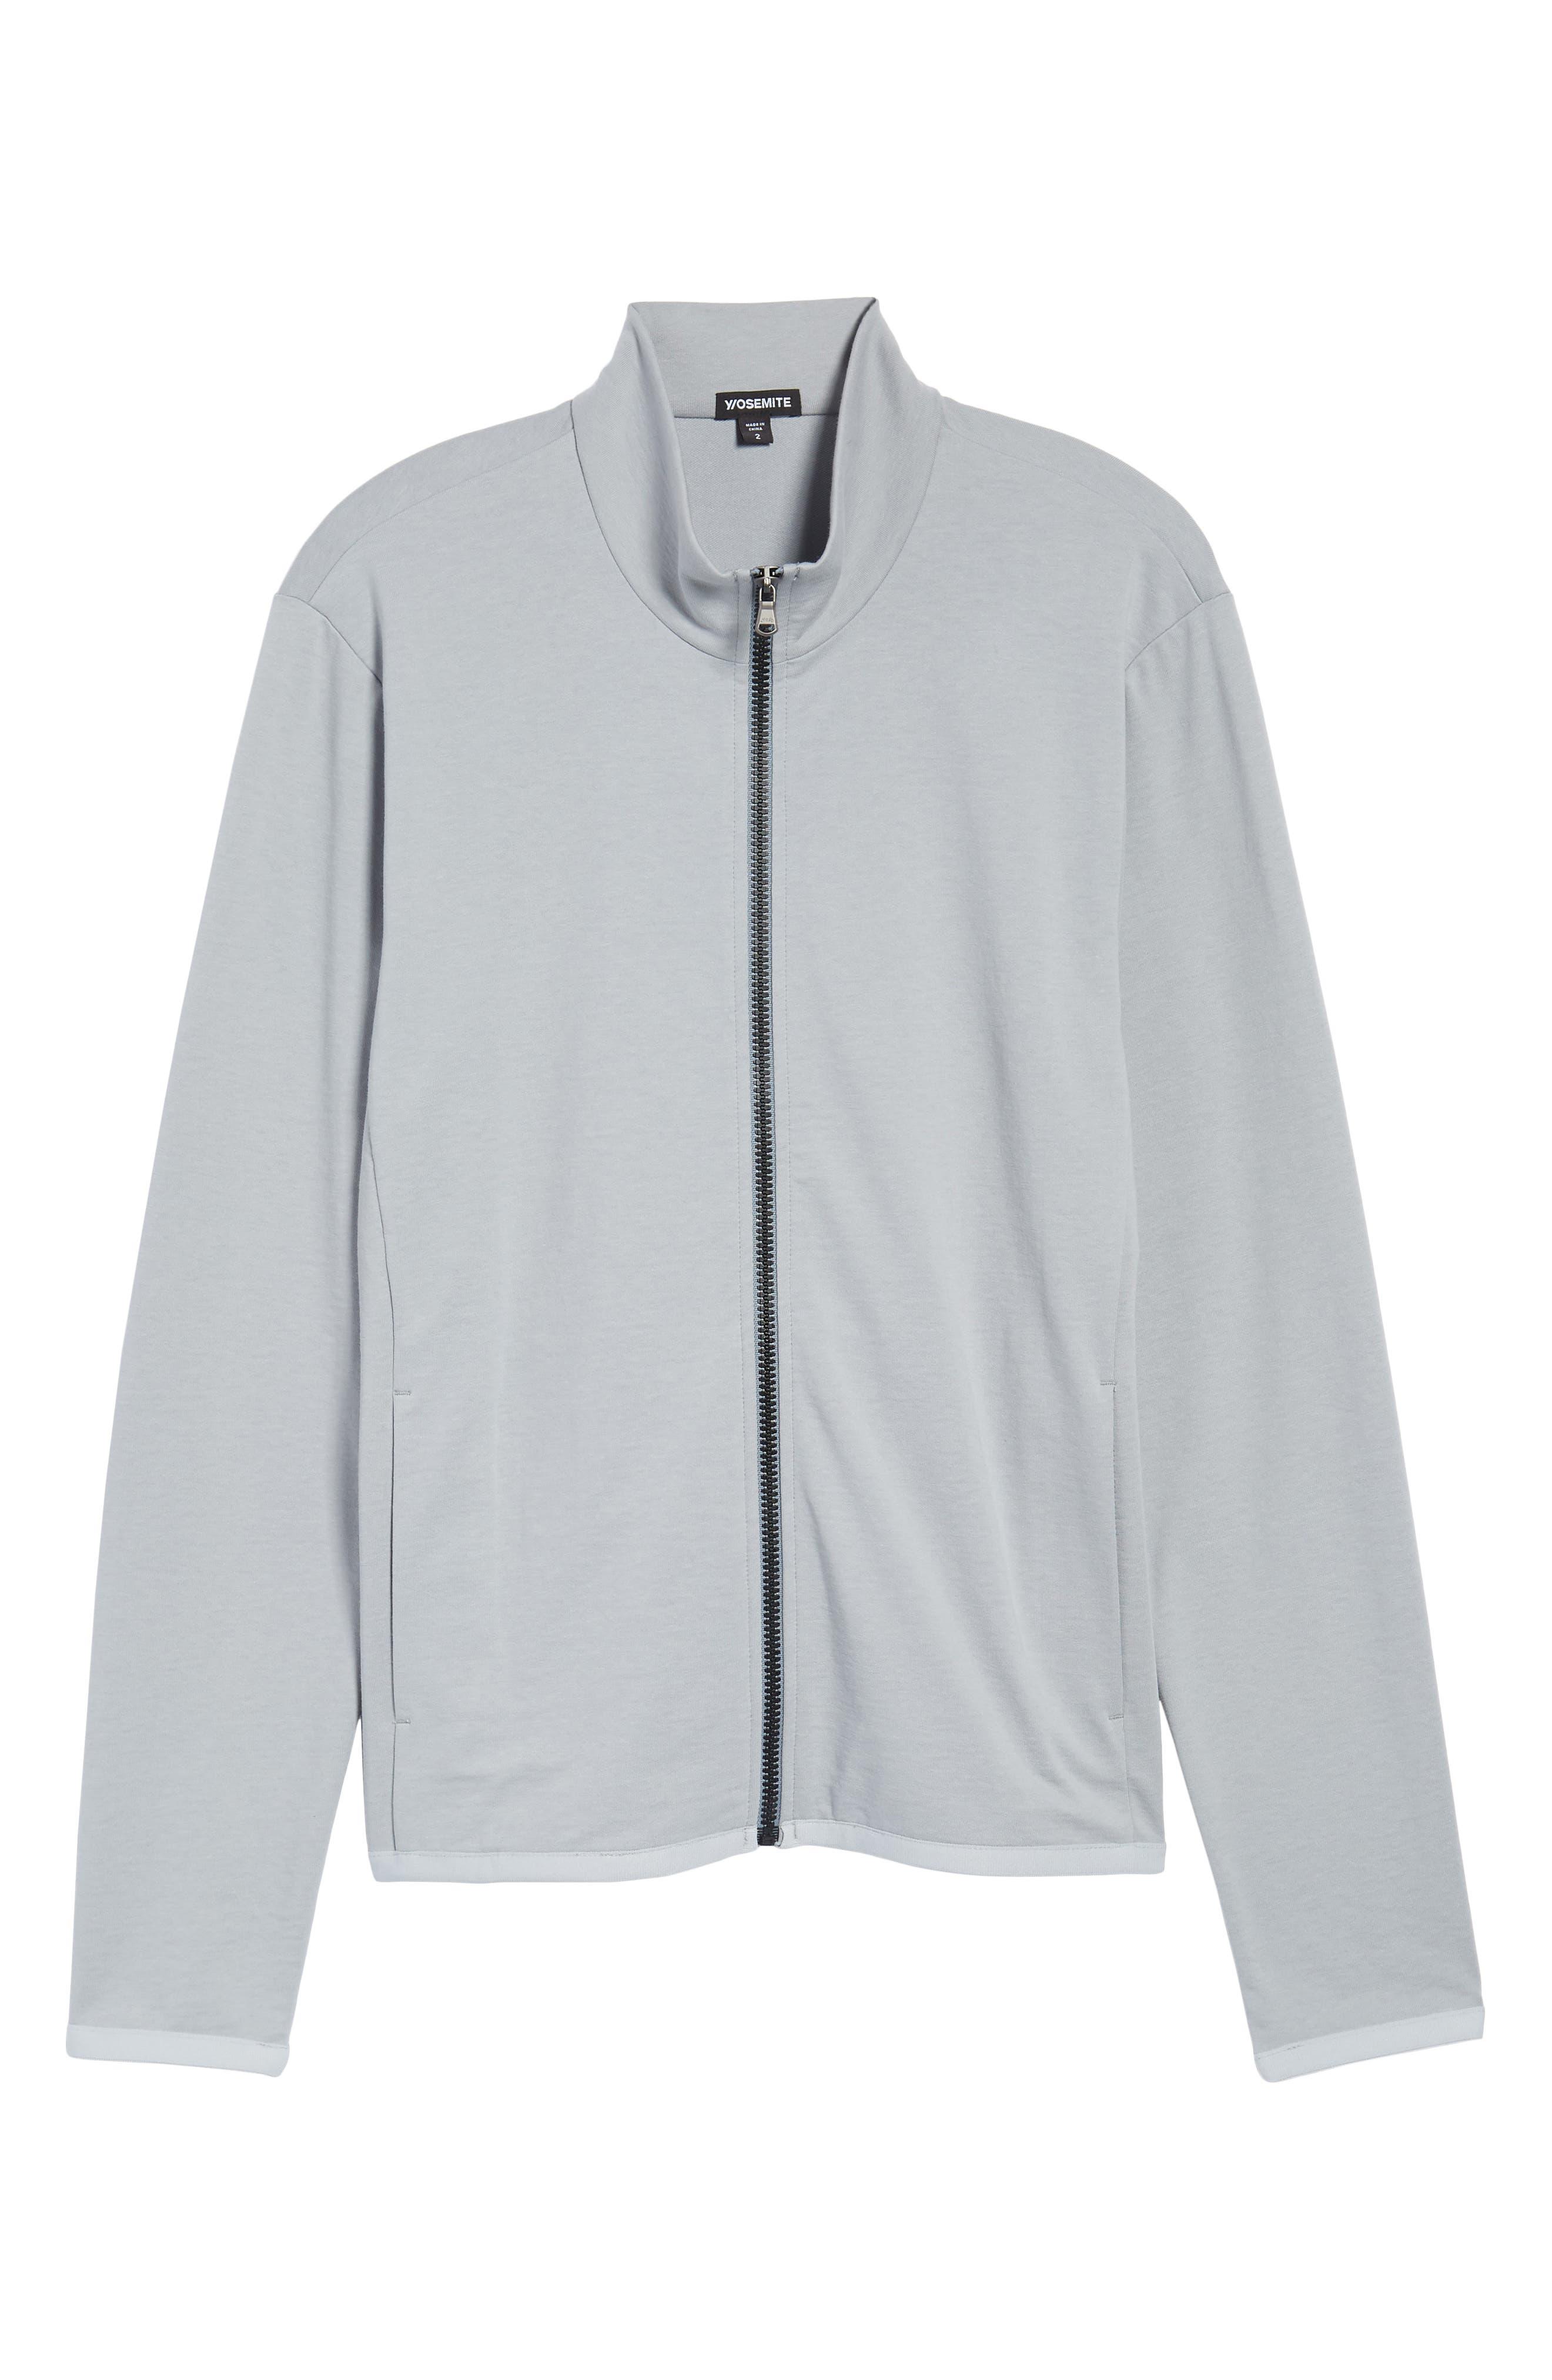 Slim Fit Compact Terry Zip Jacket,                             Alternate thumbnail 6, color,                             Grey Sky/ Light Grey